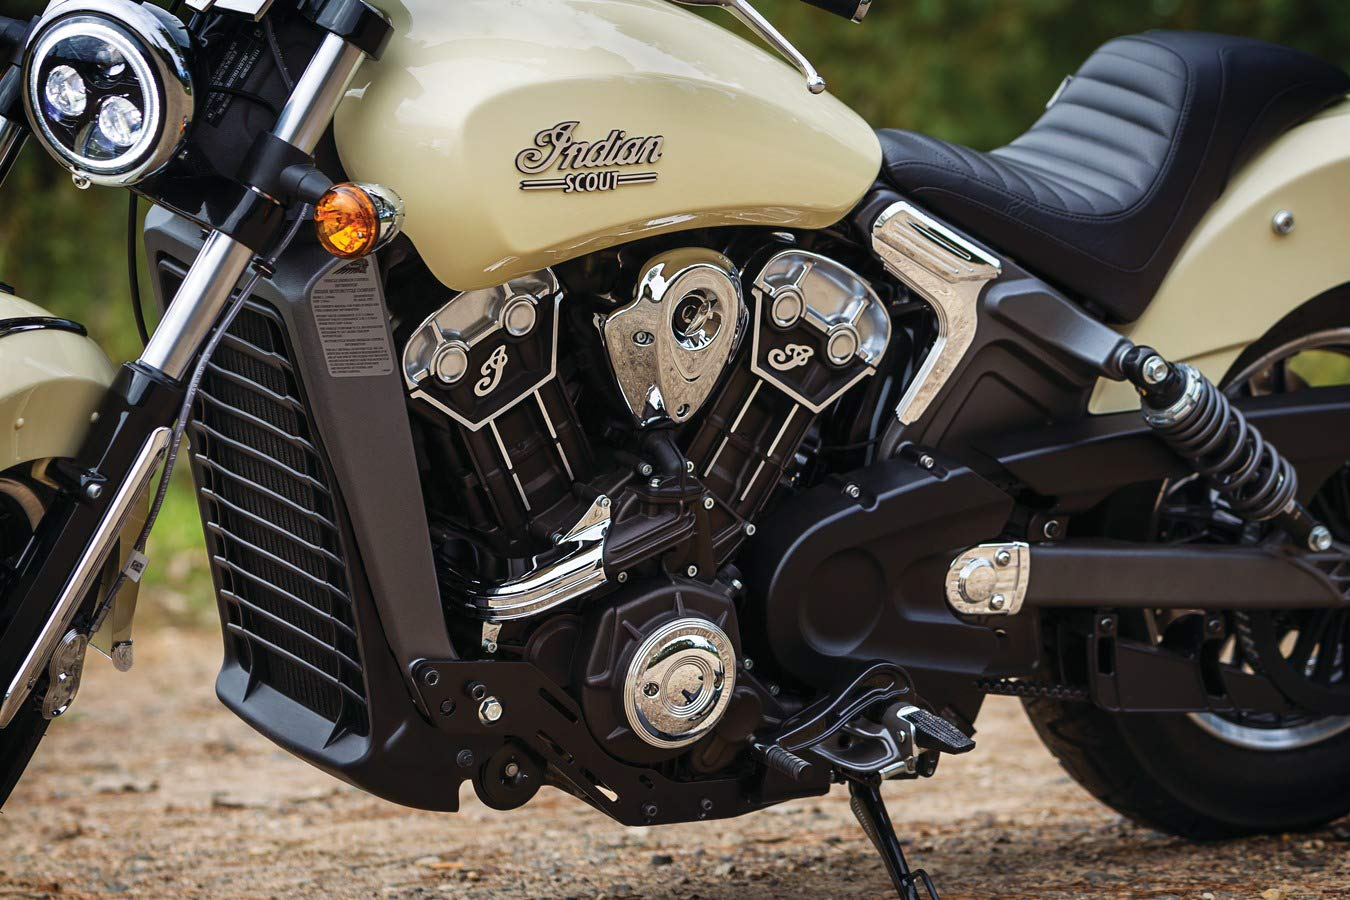 Kuryakyn 5662 Chrome Motorcycle Accent